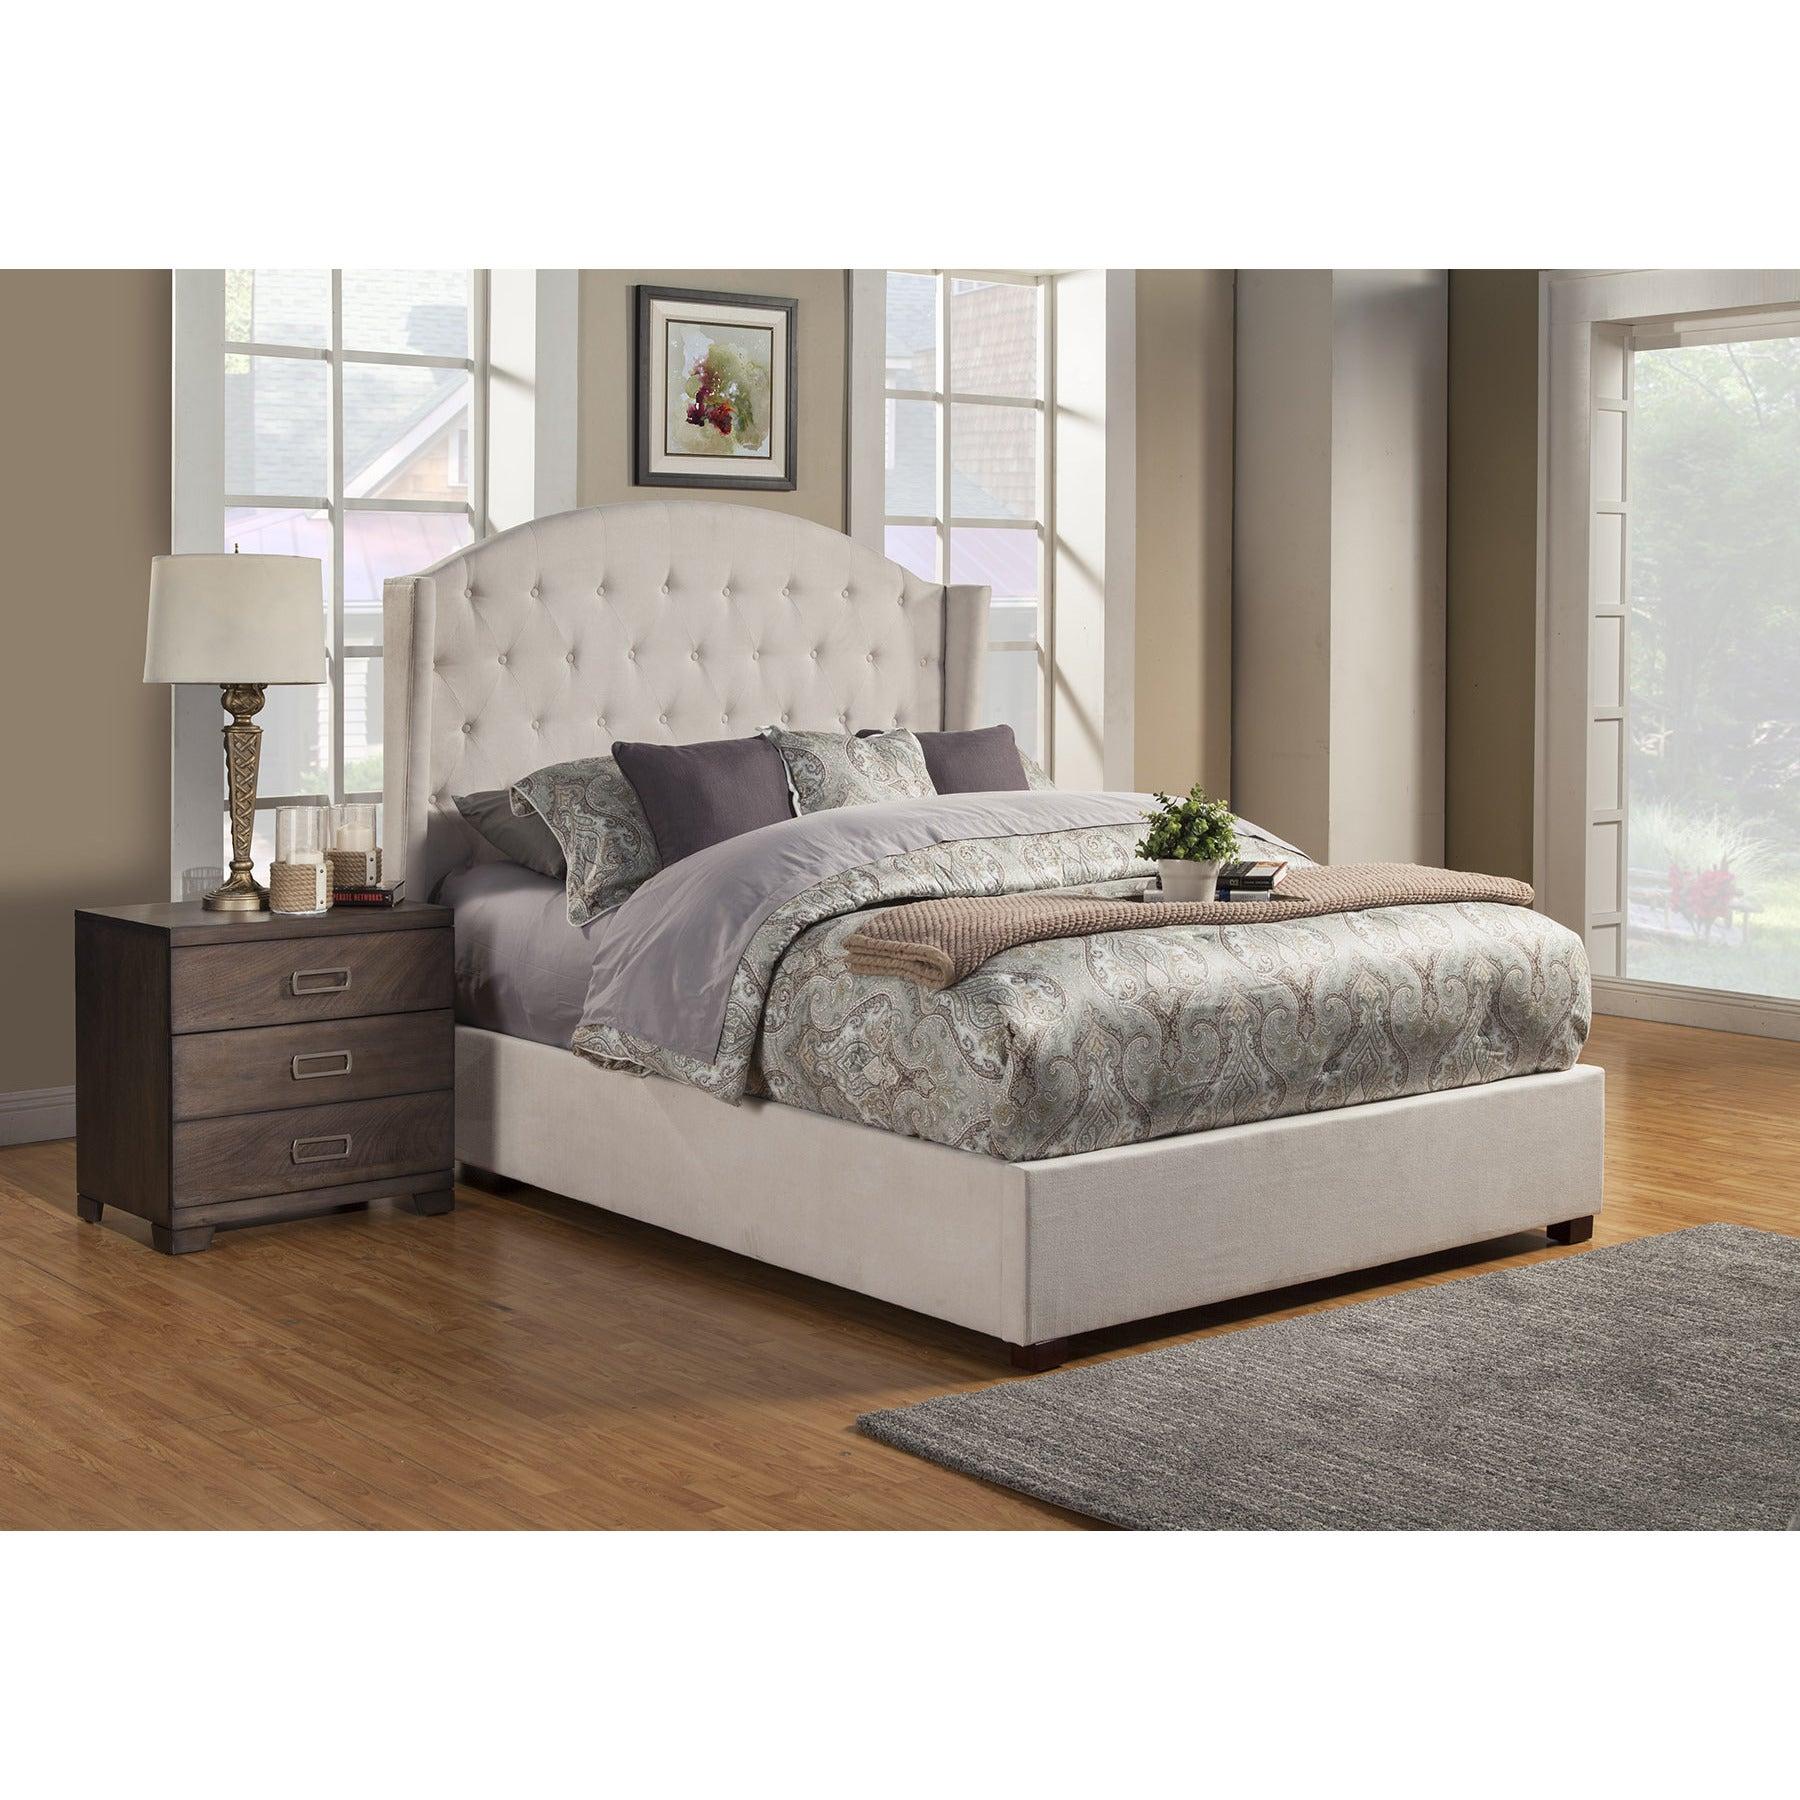 Alpine Ava Cream (Ivory) Wood Tufted Upholstered Bed (Eas...